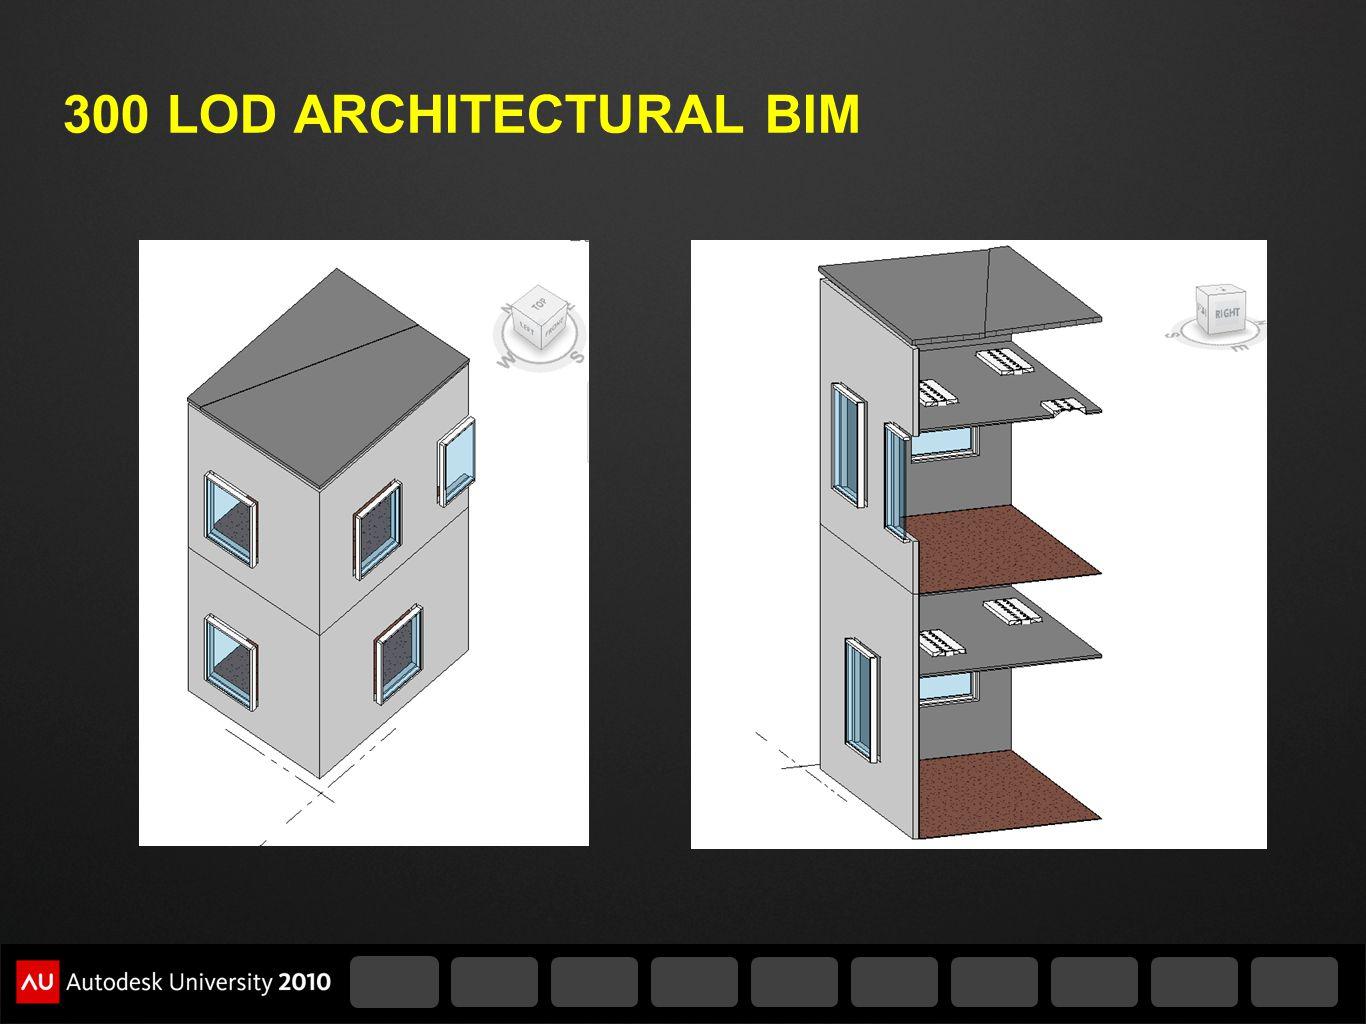 300 LOD ARCHITECTURAL BIM